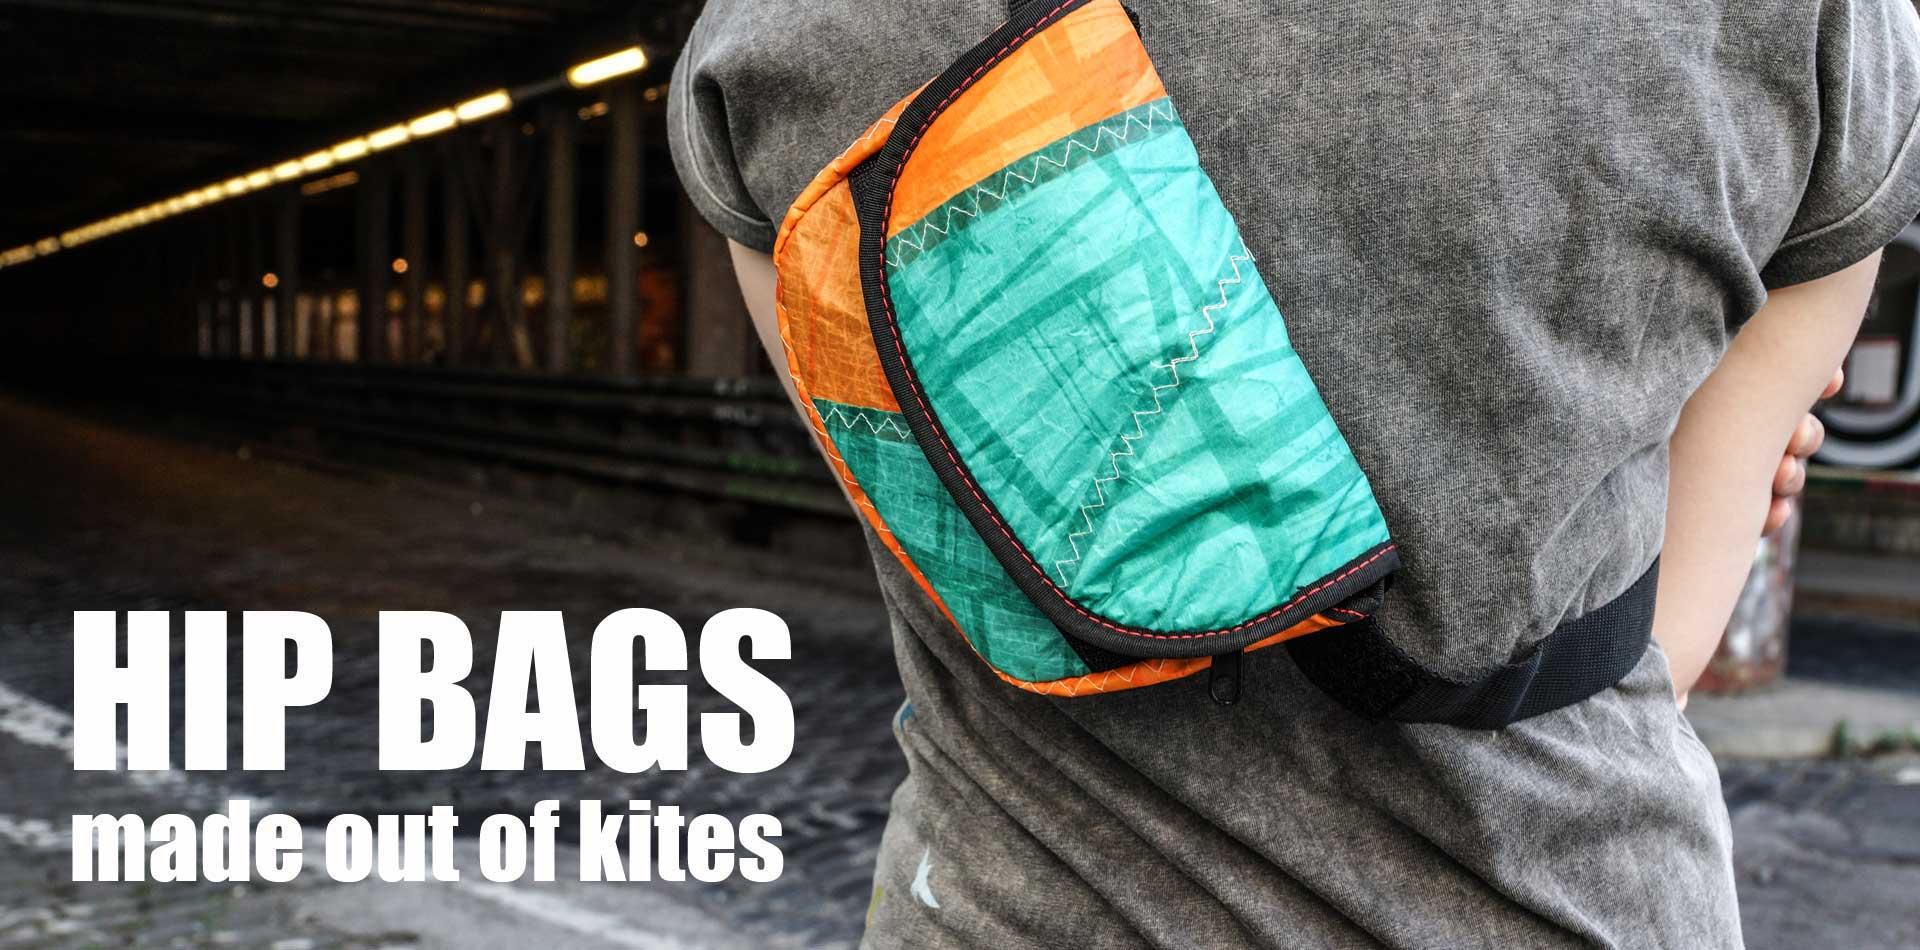 Abwrackprämie -Hip Bags aus alten Kites